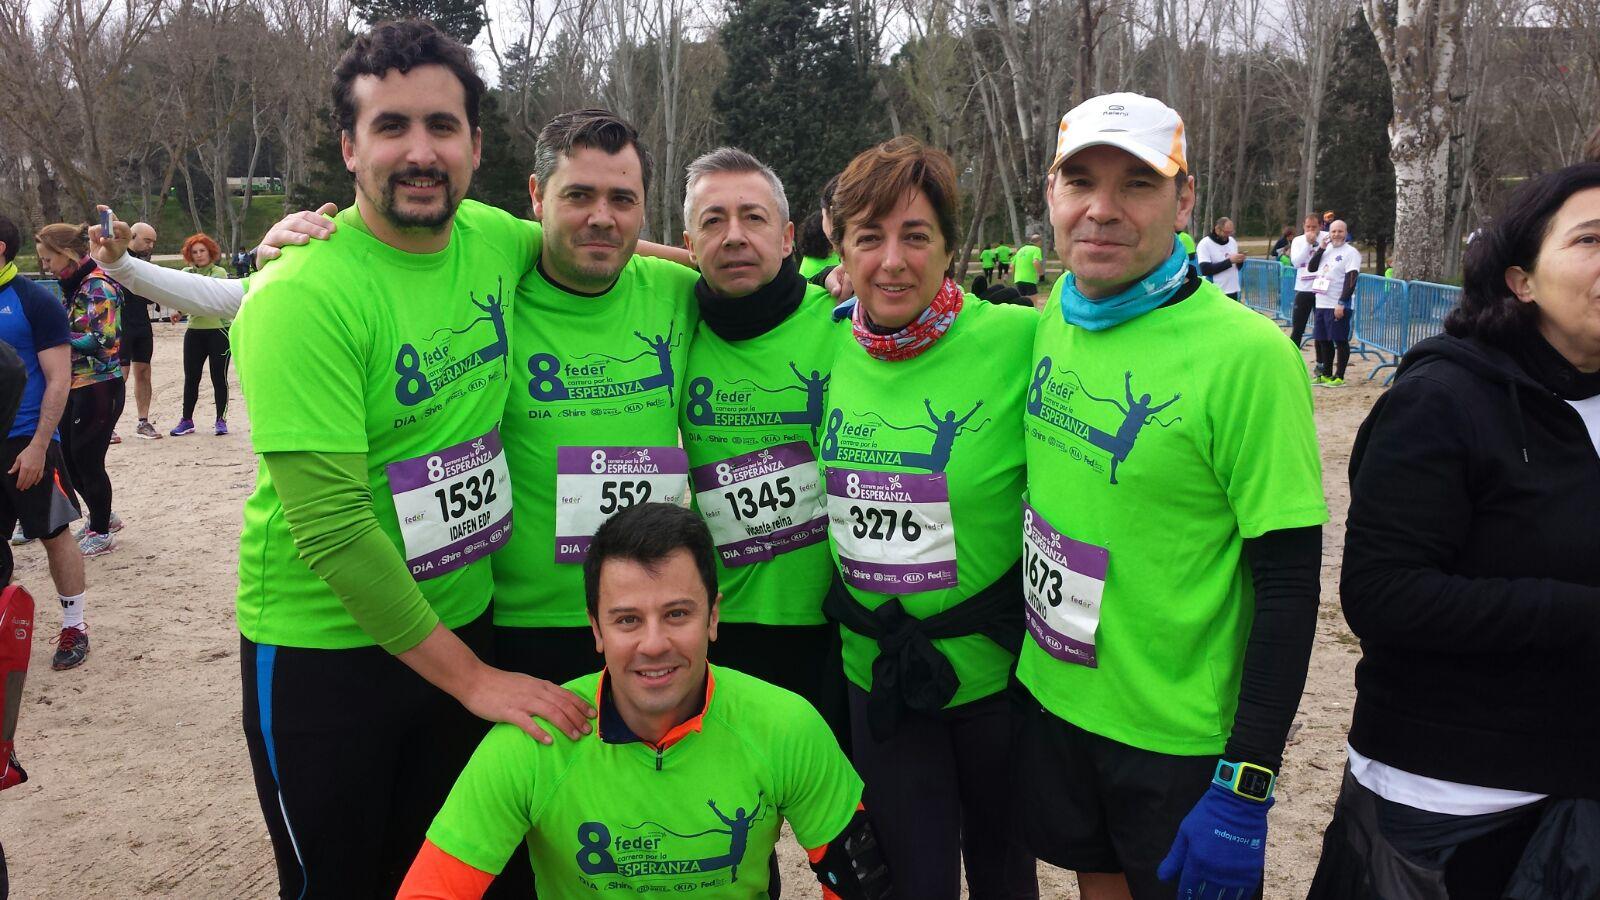 VIII Carrera por la Esperanza - EDP MADRID Centro deportivo